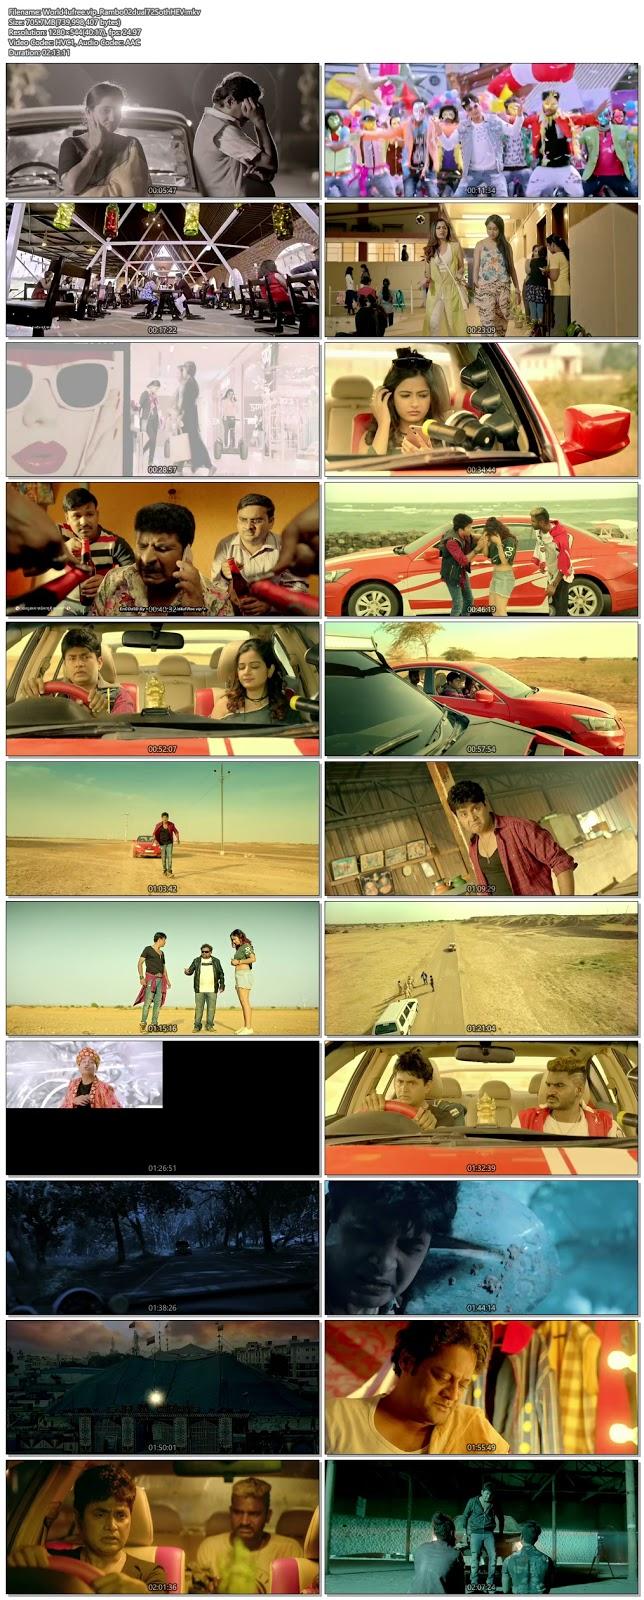 Raambo 2 2018 Dual Audio 720p UNCUT HDRip 700Mb x265 HEVC world4ufree.vip , South indian movie Raambo 2 2018 hindi dubbed world4ufree.vip 720p hdrip webrip dvdrip 700mb brrip bluray free download or watch online at world4ufree.vip